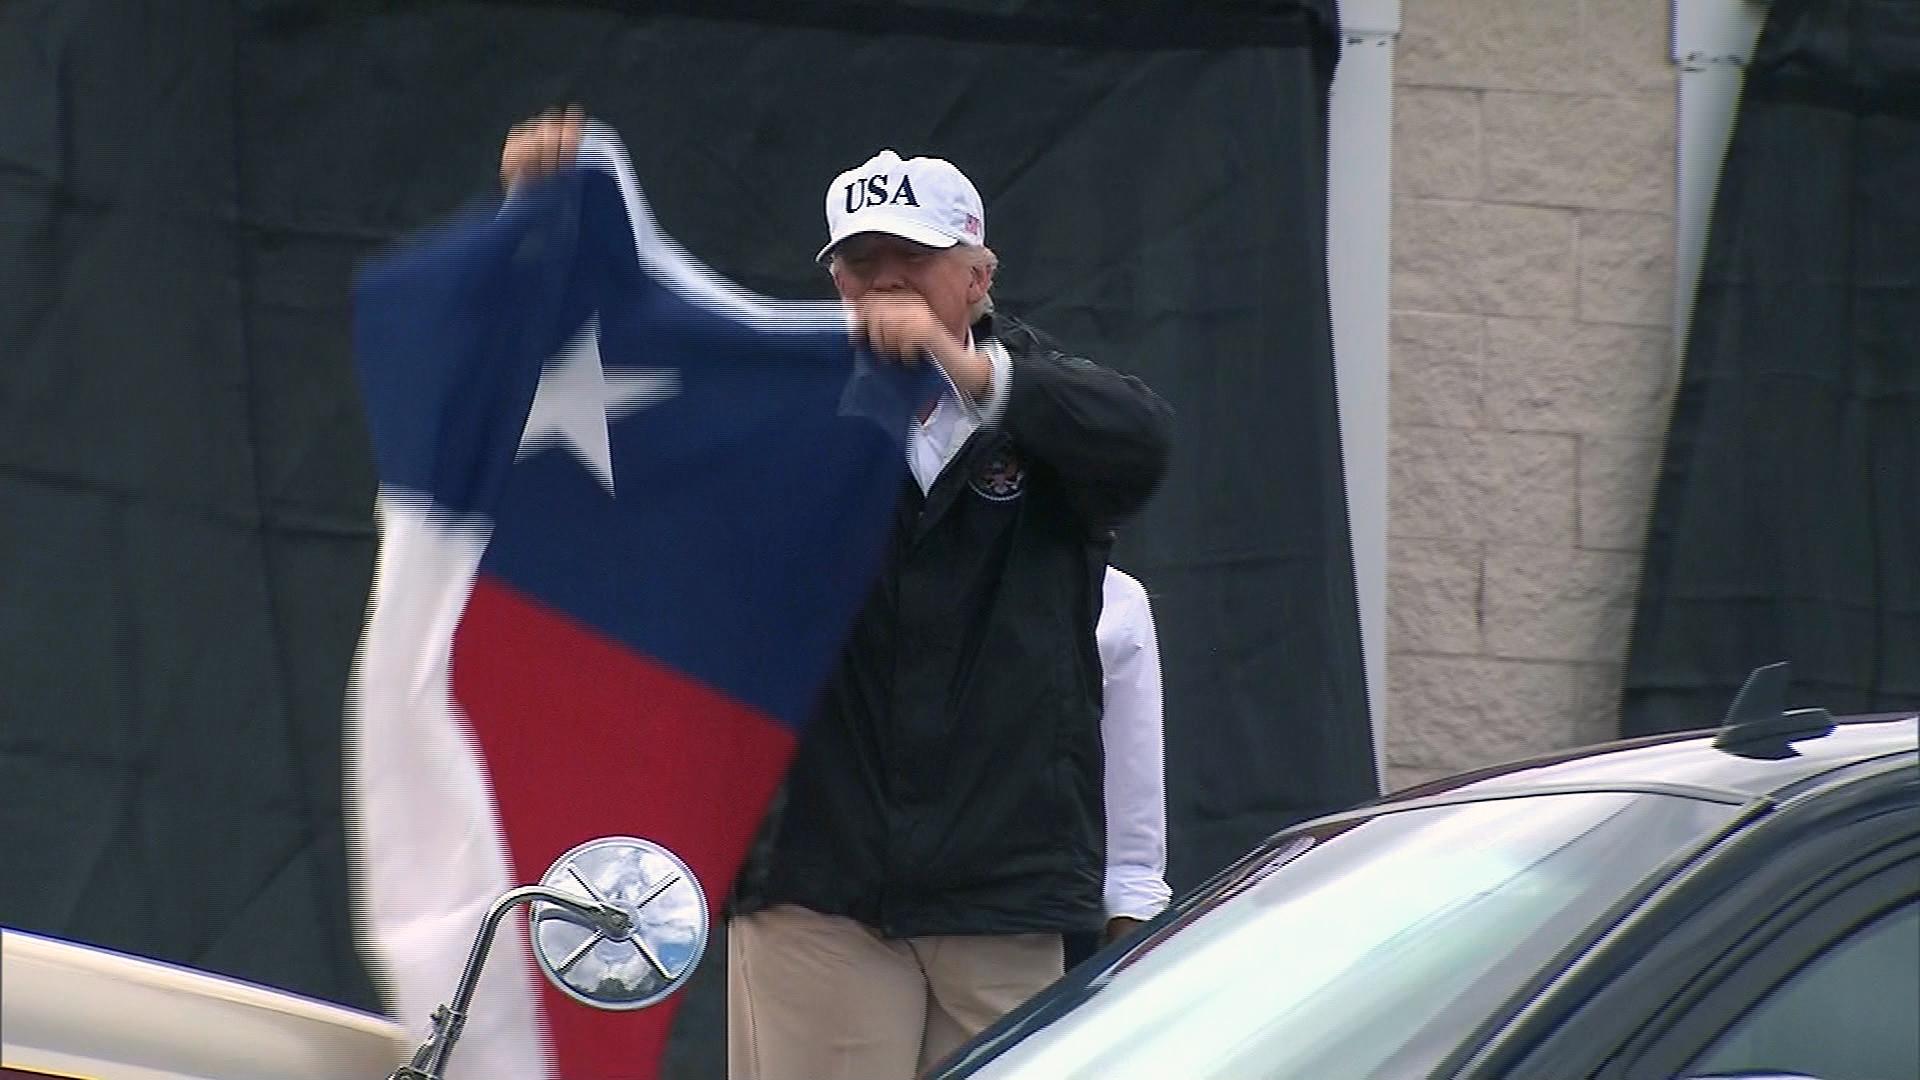 Trump waiving Texas flag-159532.jpg89996242